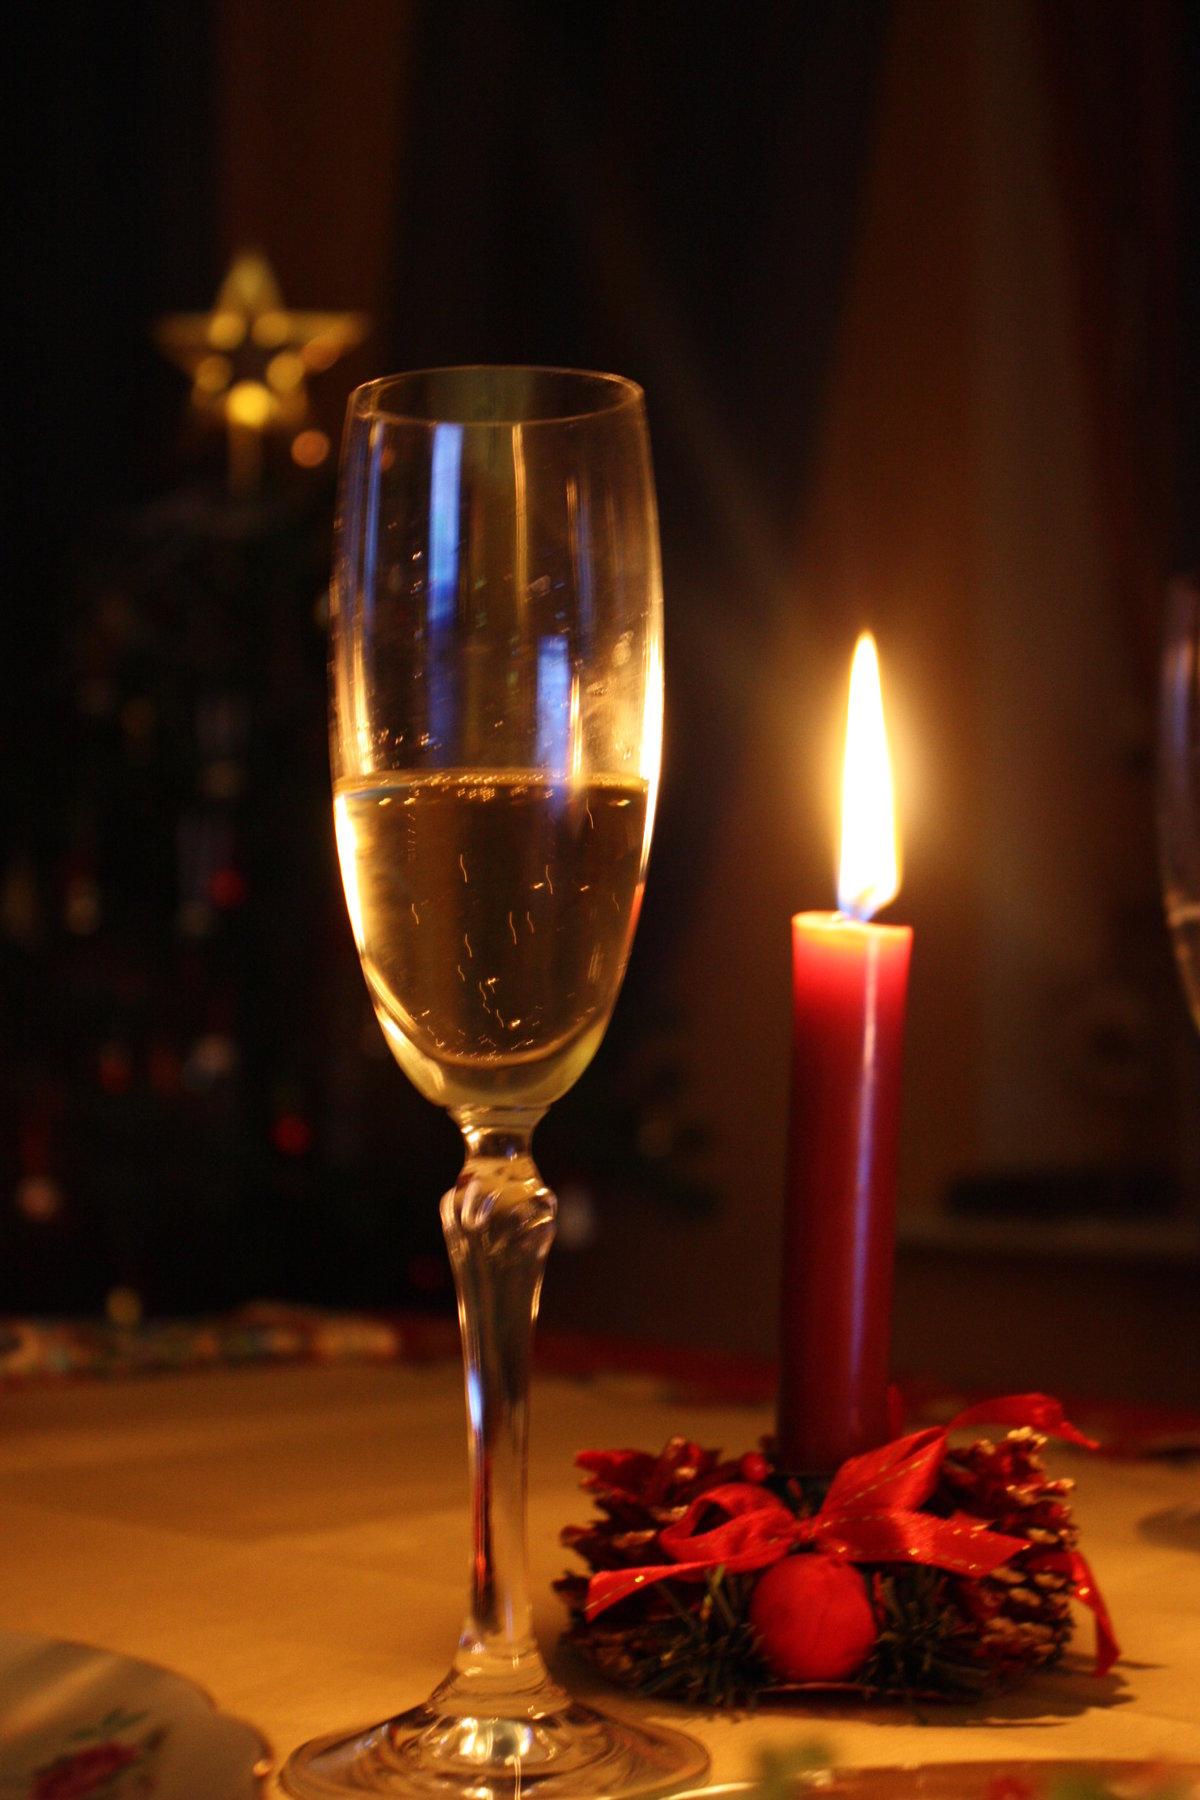 артамонов картинки бокал вина свечи контурная